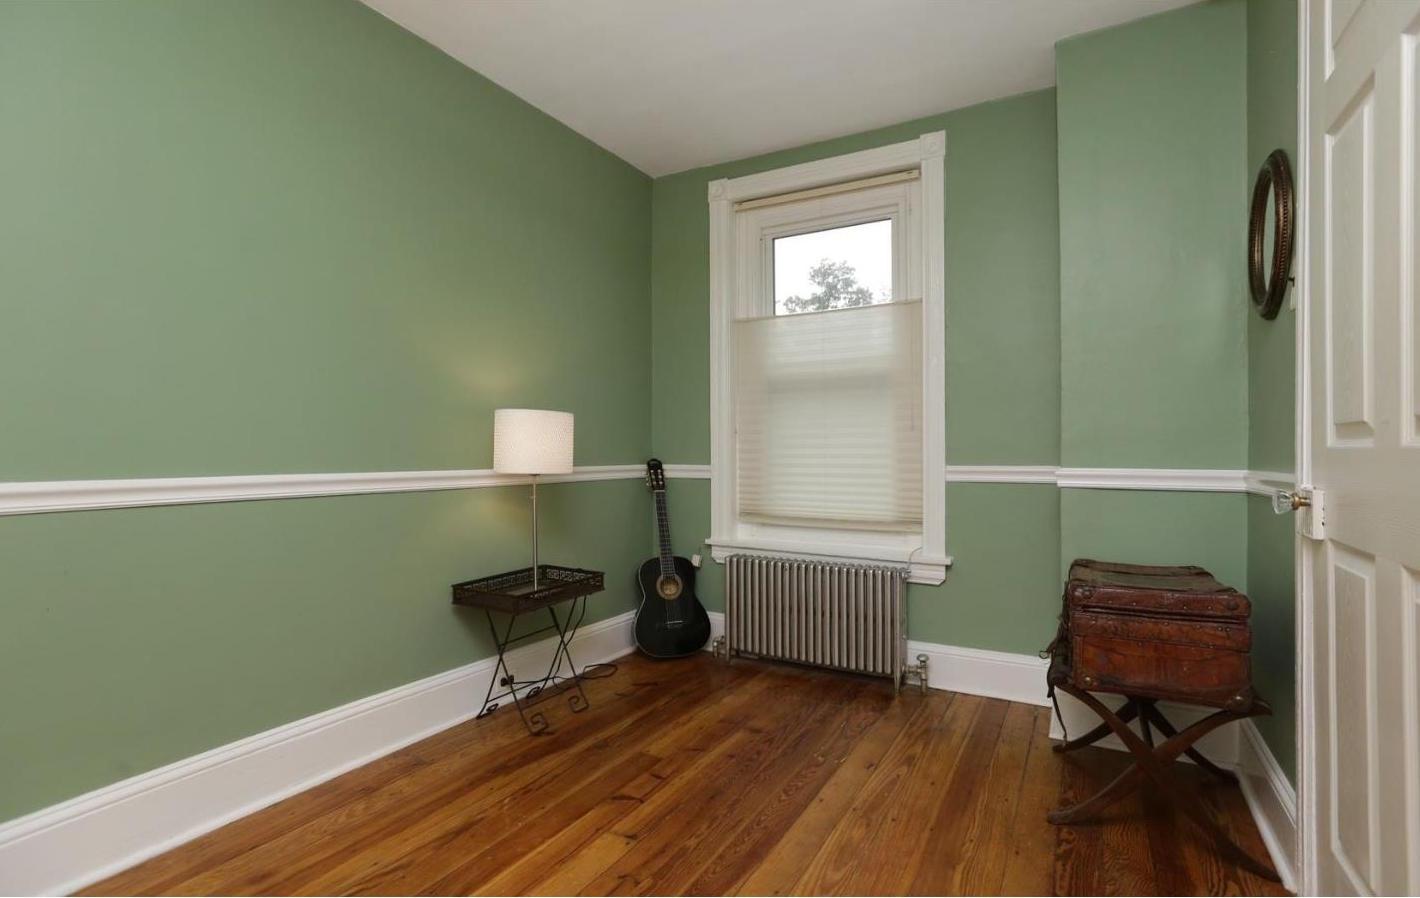 lawnton bedroom 4.jpeg